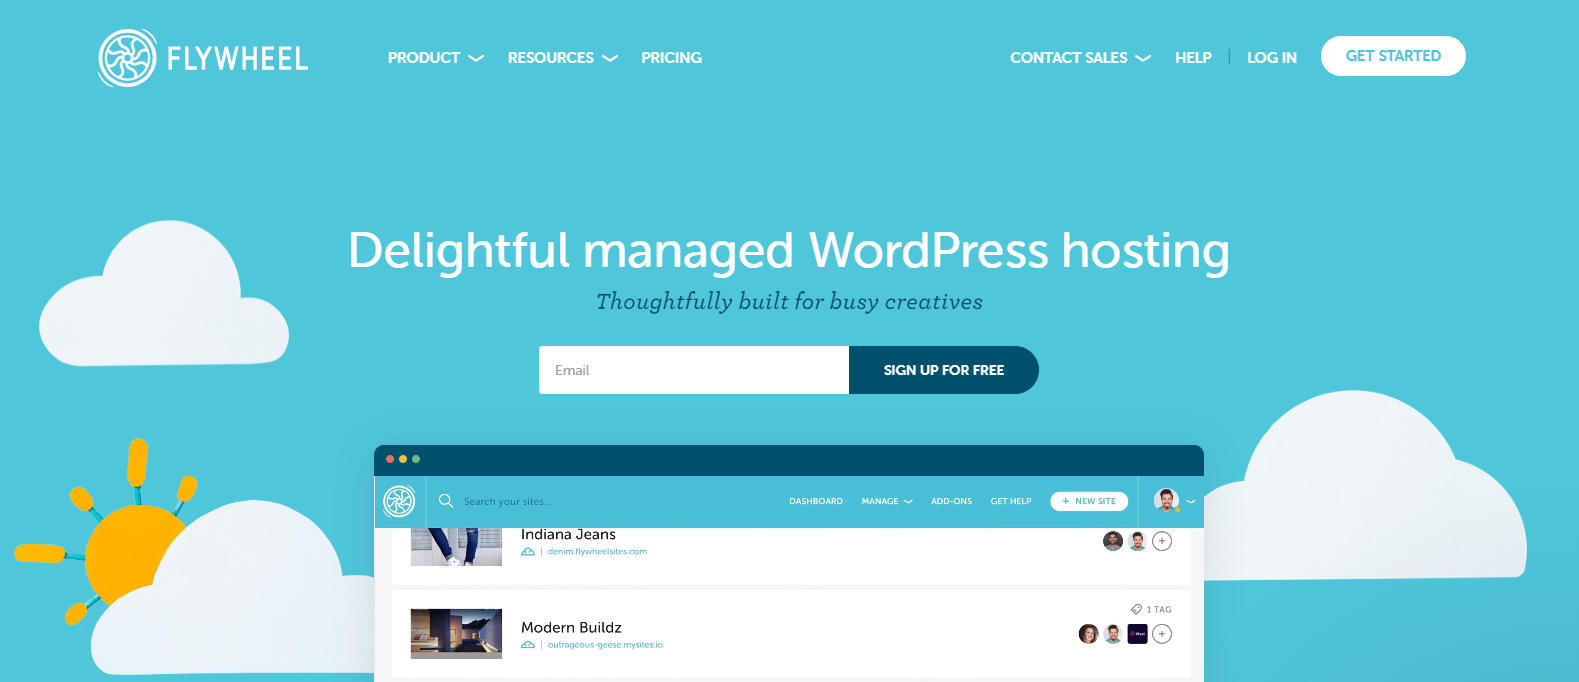 Fastest WordPress hosting: Flywheel